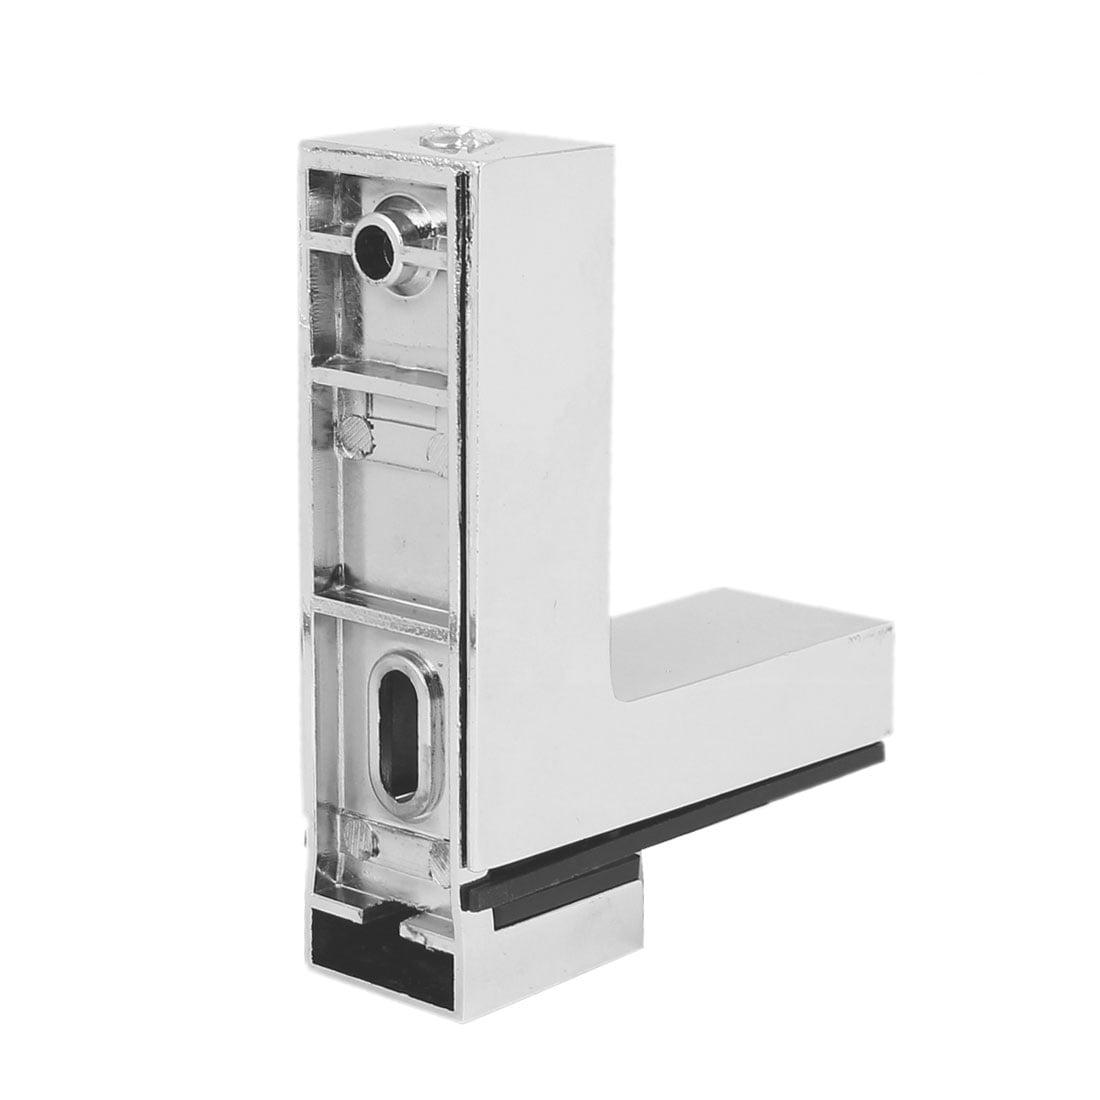 Wall Cabinet Metal Adjustable Glass Clip Shelf Clamp Support Bracket Holder - image 2 of 6